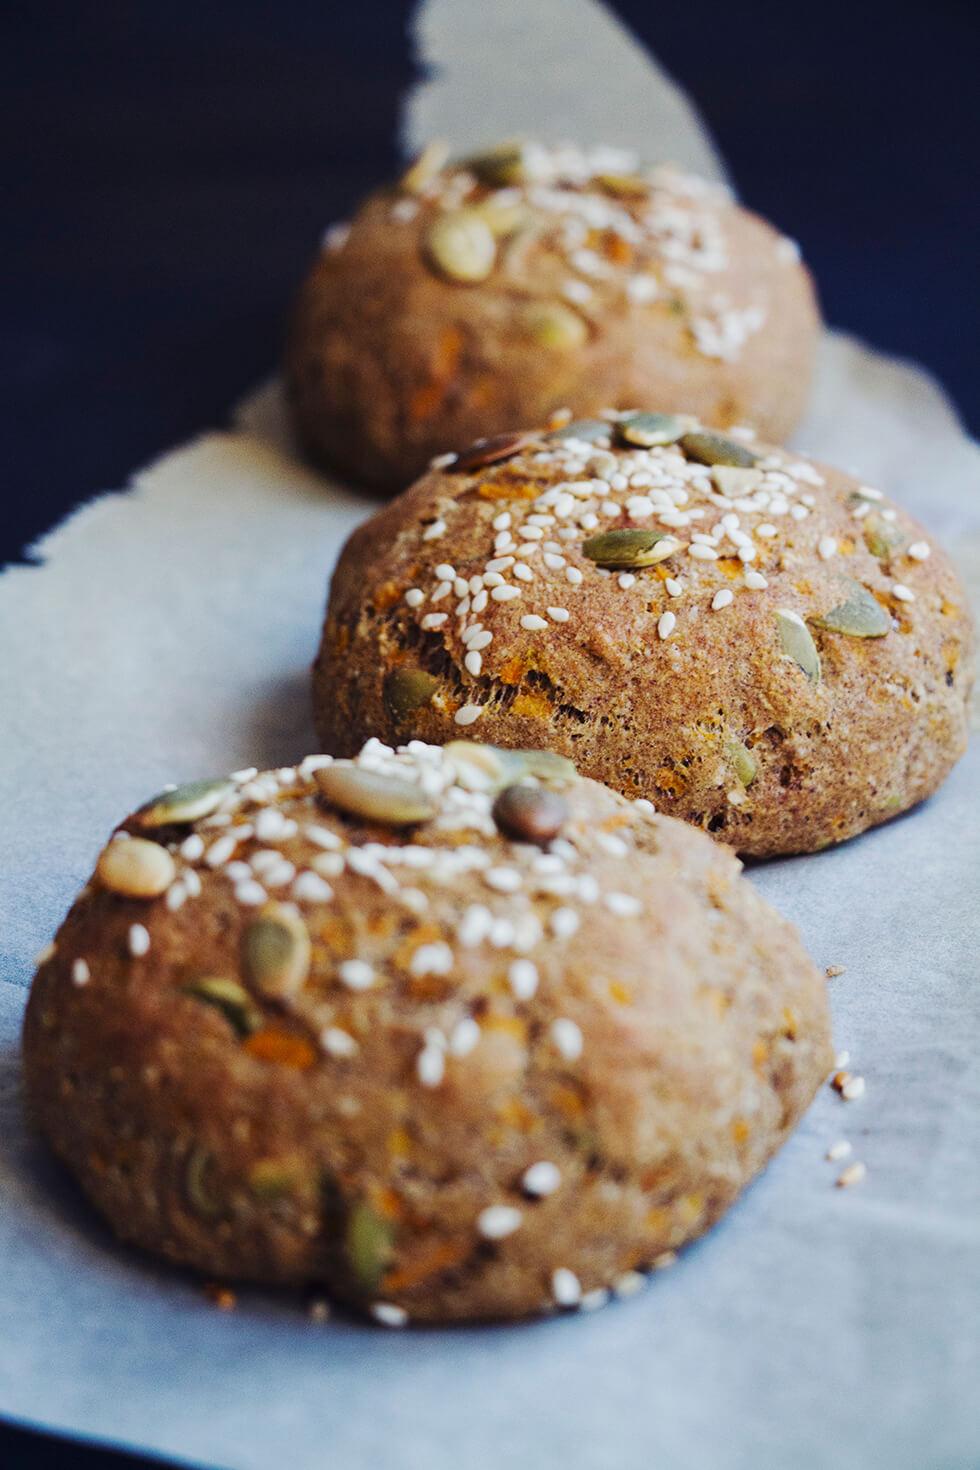 saftiga_enkla_glutenfria_frukostbrod_2